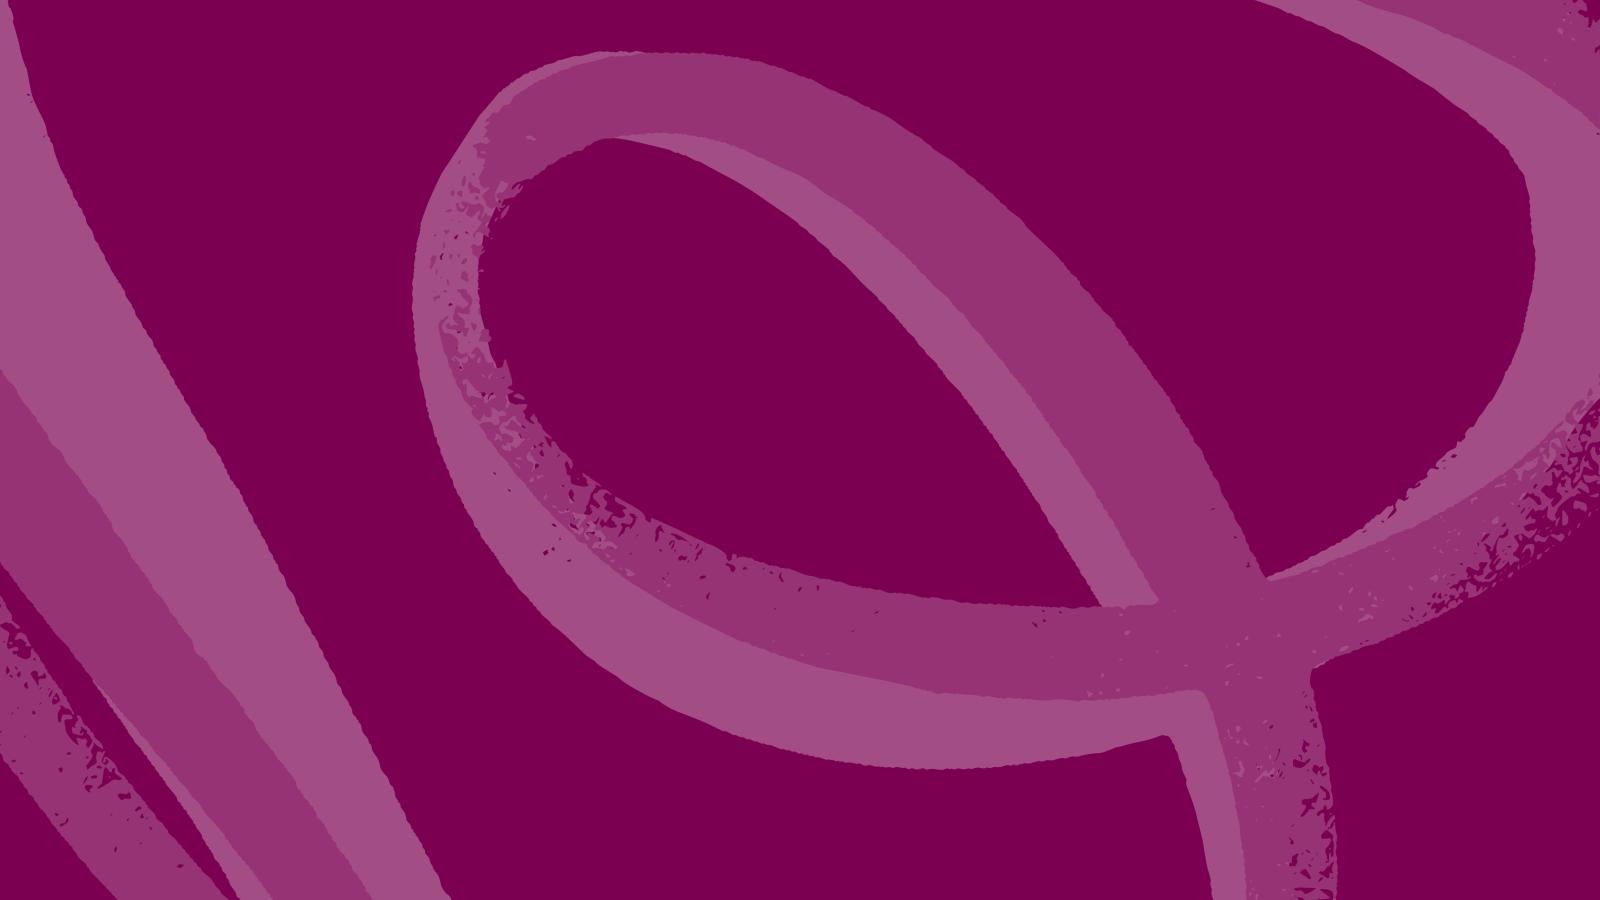 Light pink Airbnb logo on dark fuchsia background